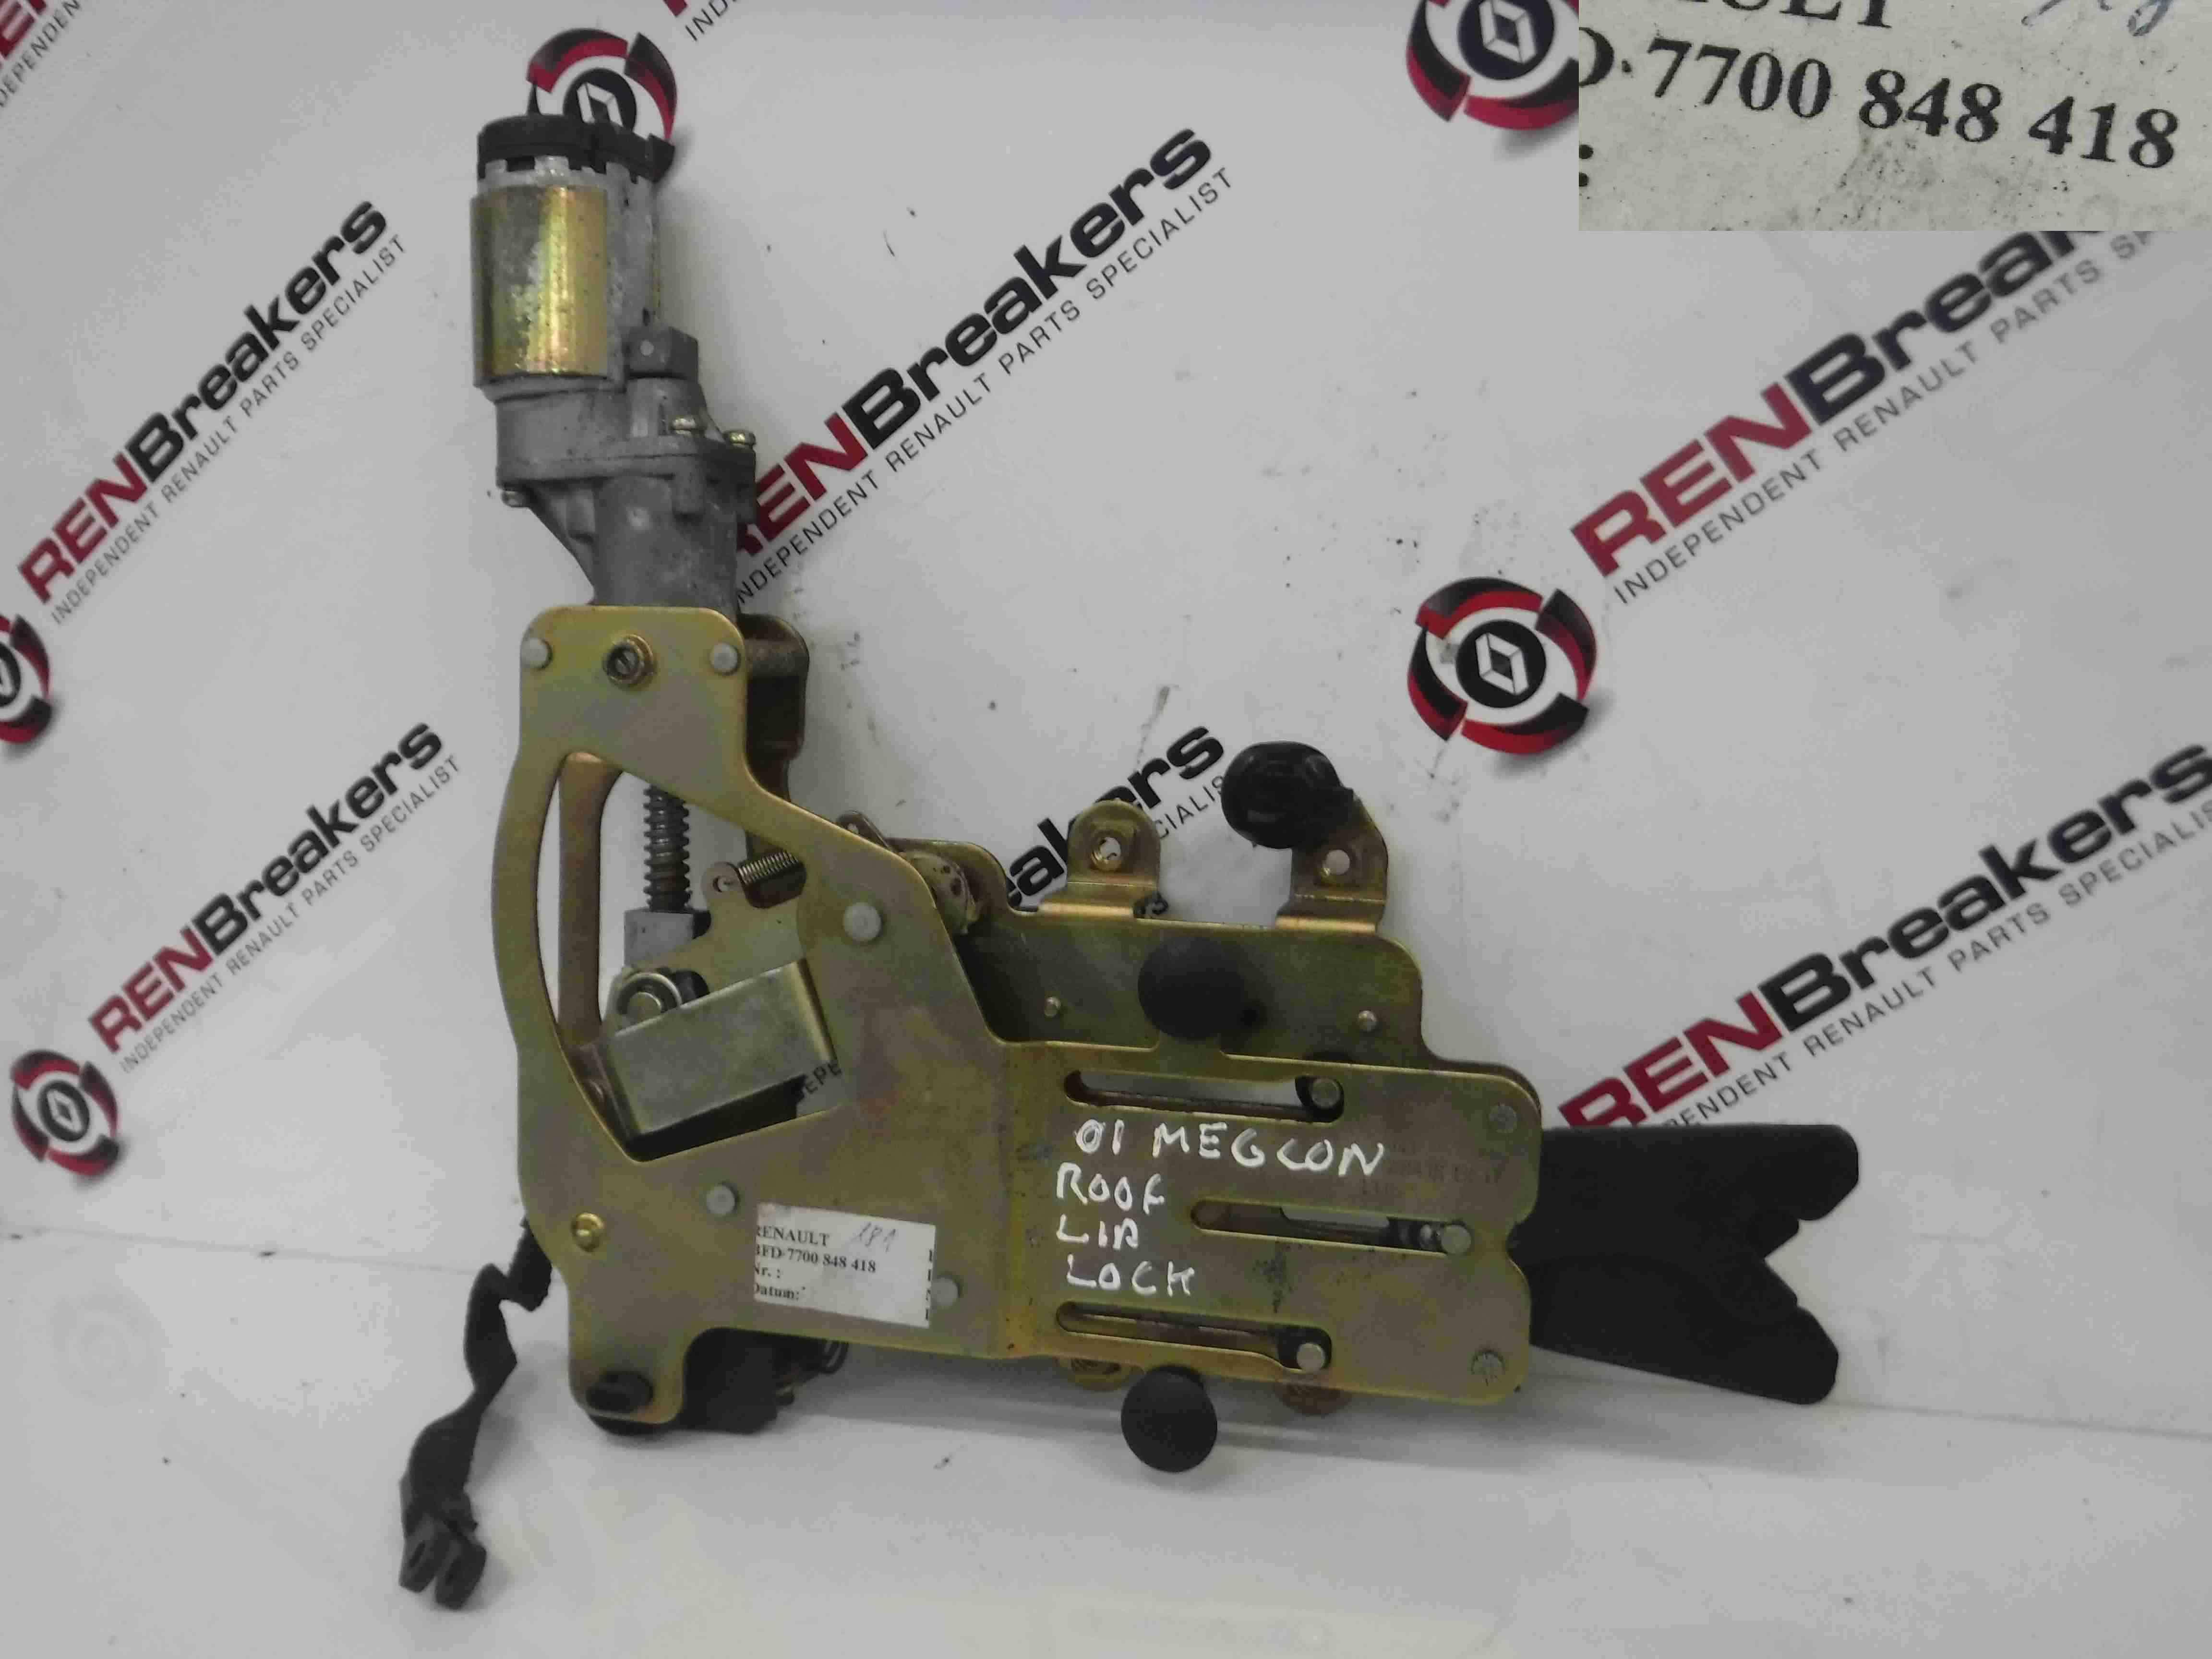 Renault Megane Convertible 1999-2002 Roof Locking Mechanism 7700848418